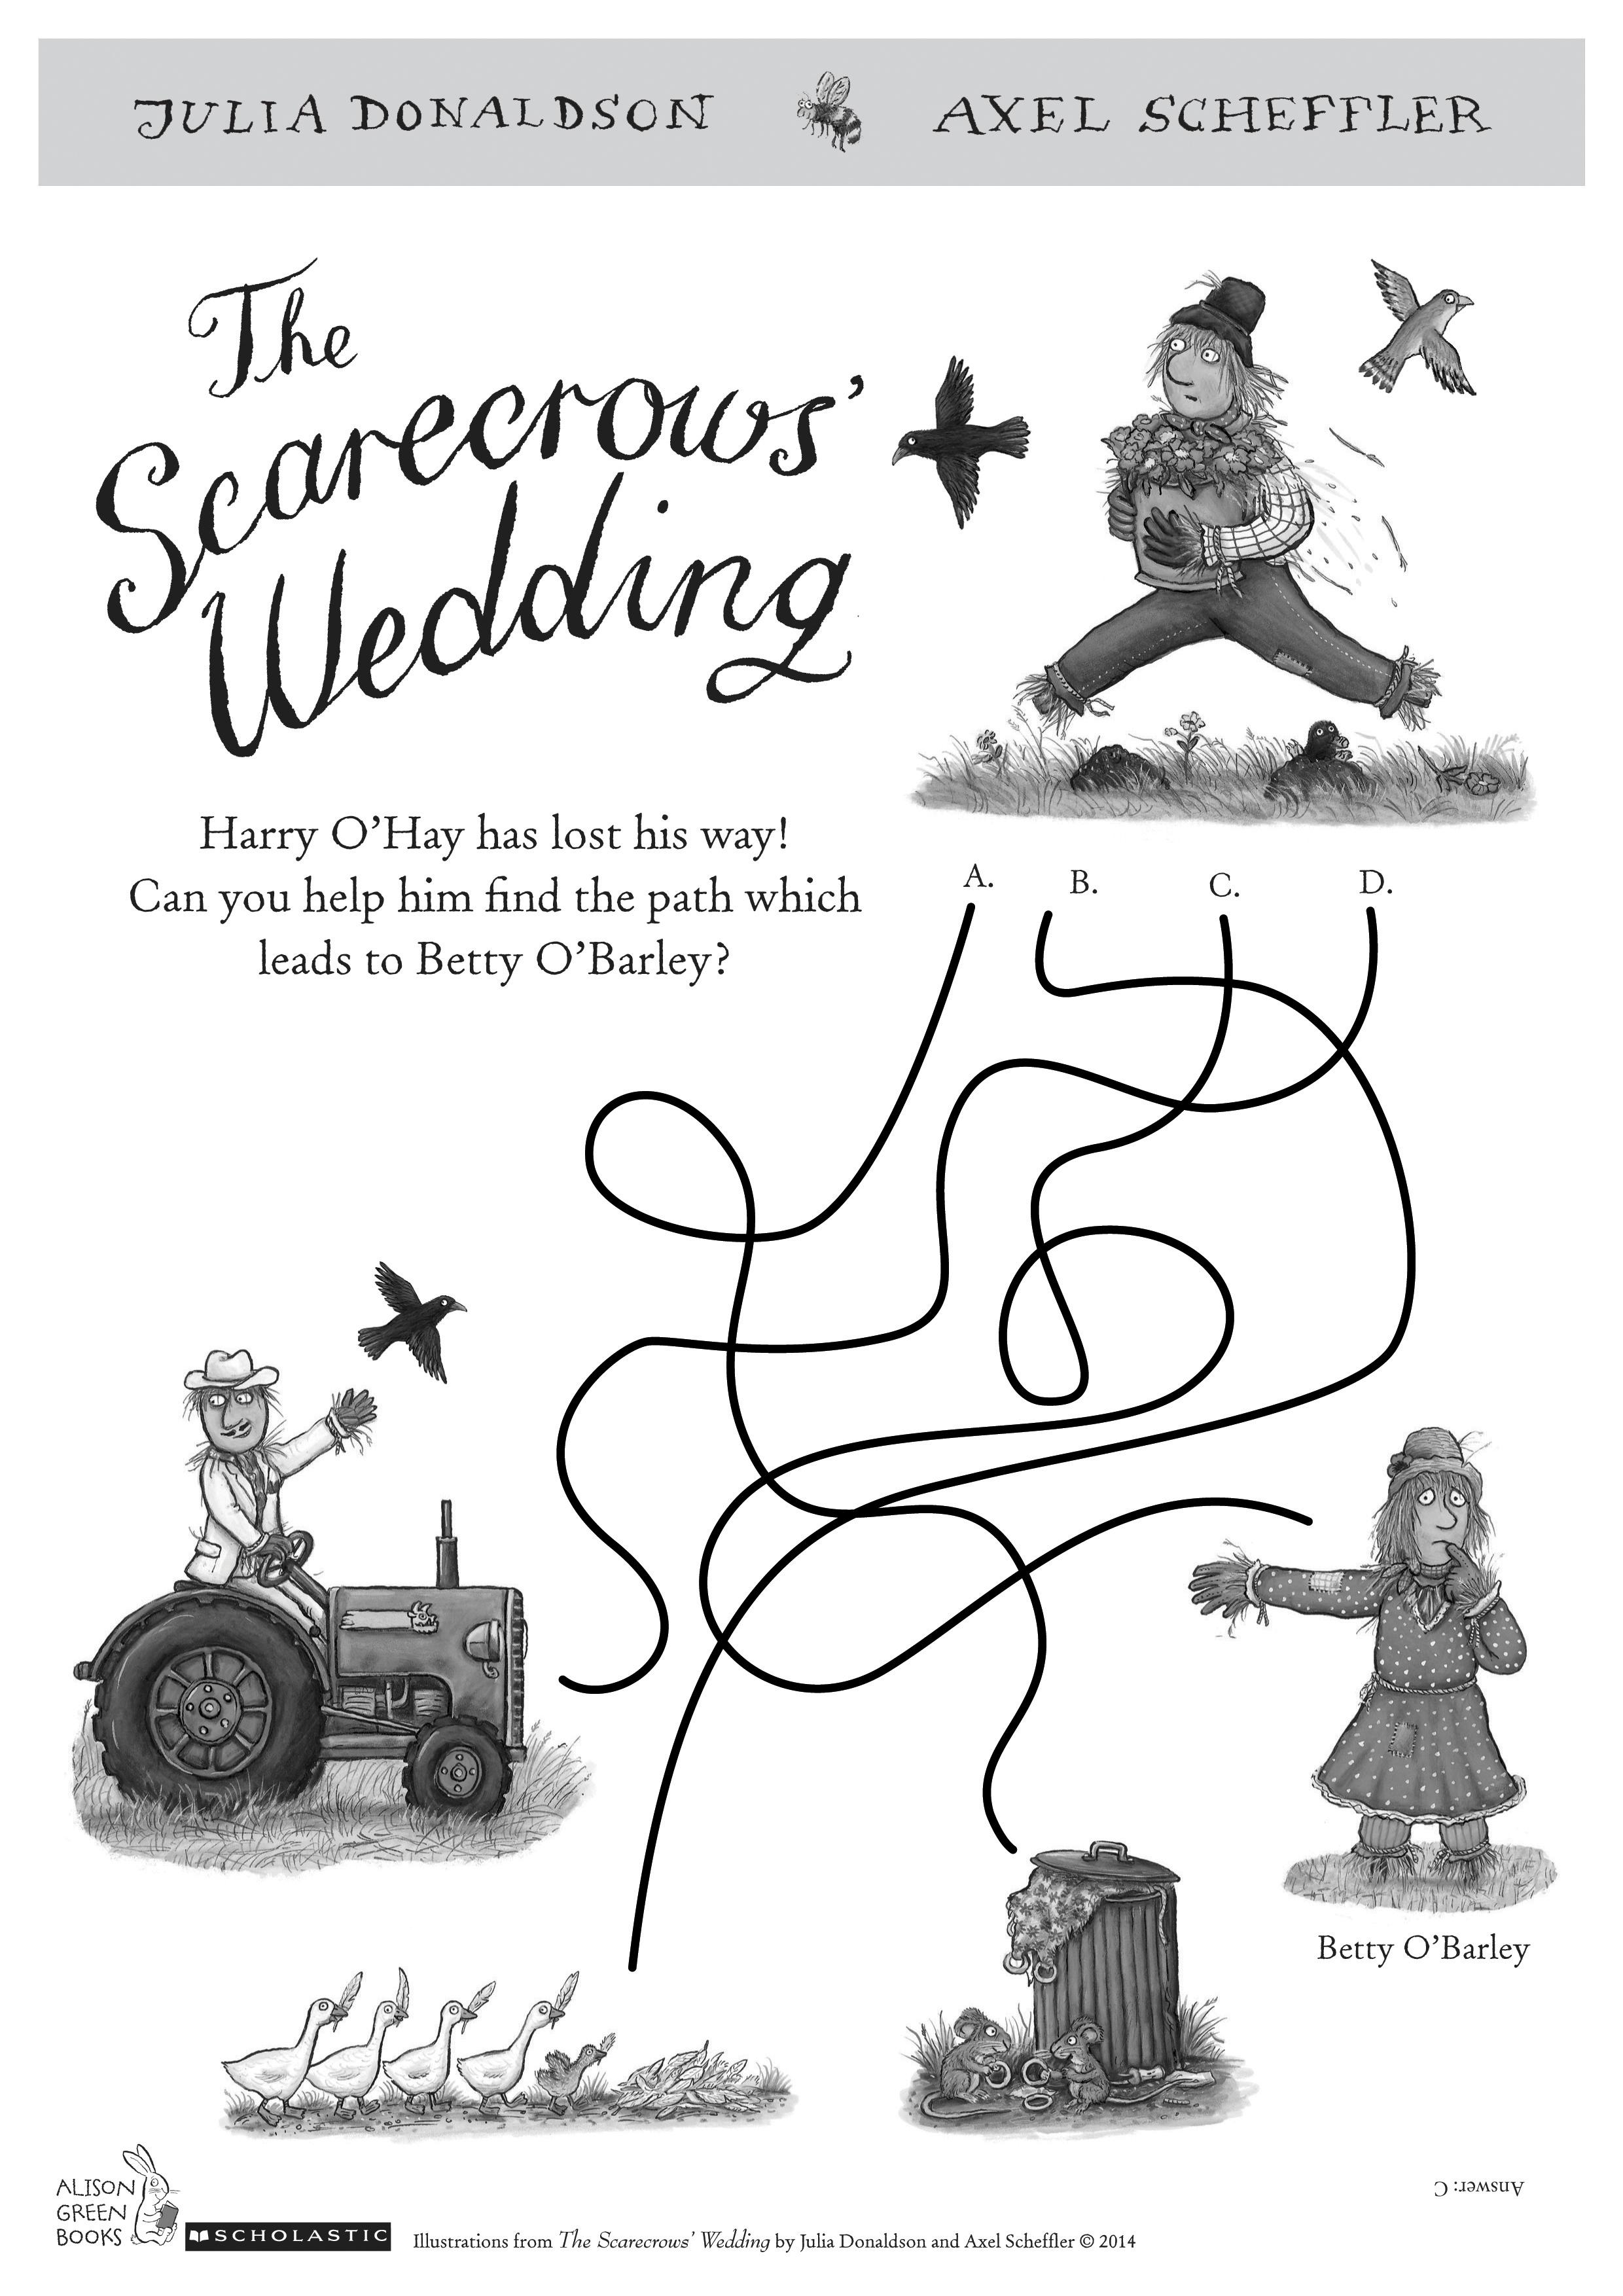 Scarecrow wedding maze act puz 1325300